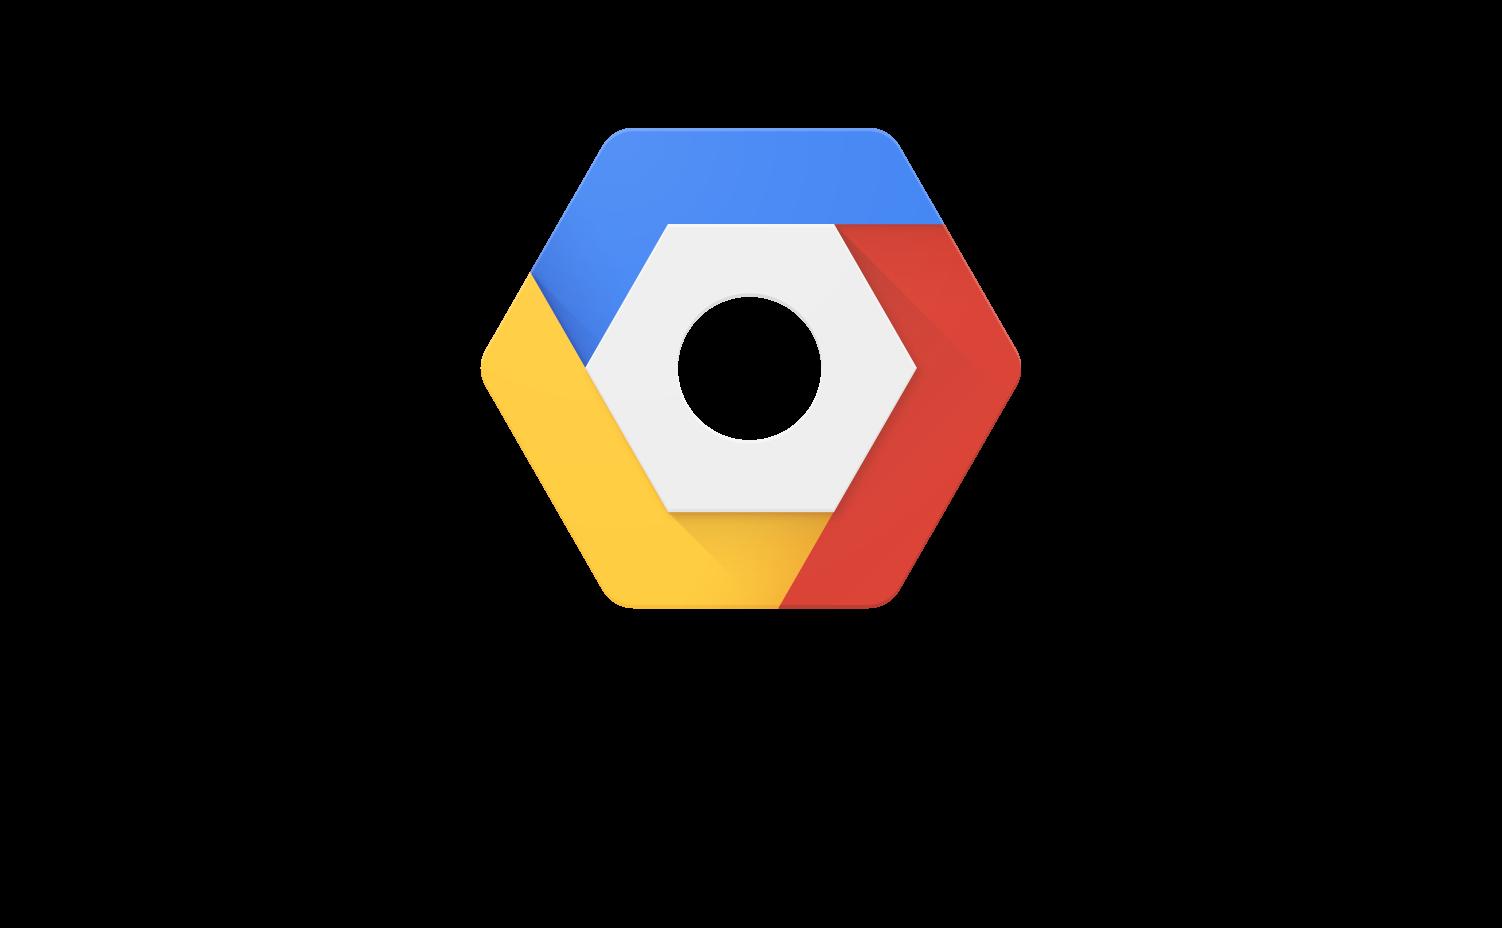 google-cloud-platform-pokemongo